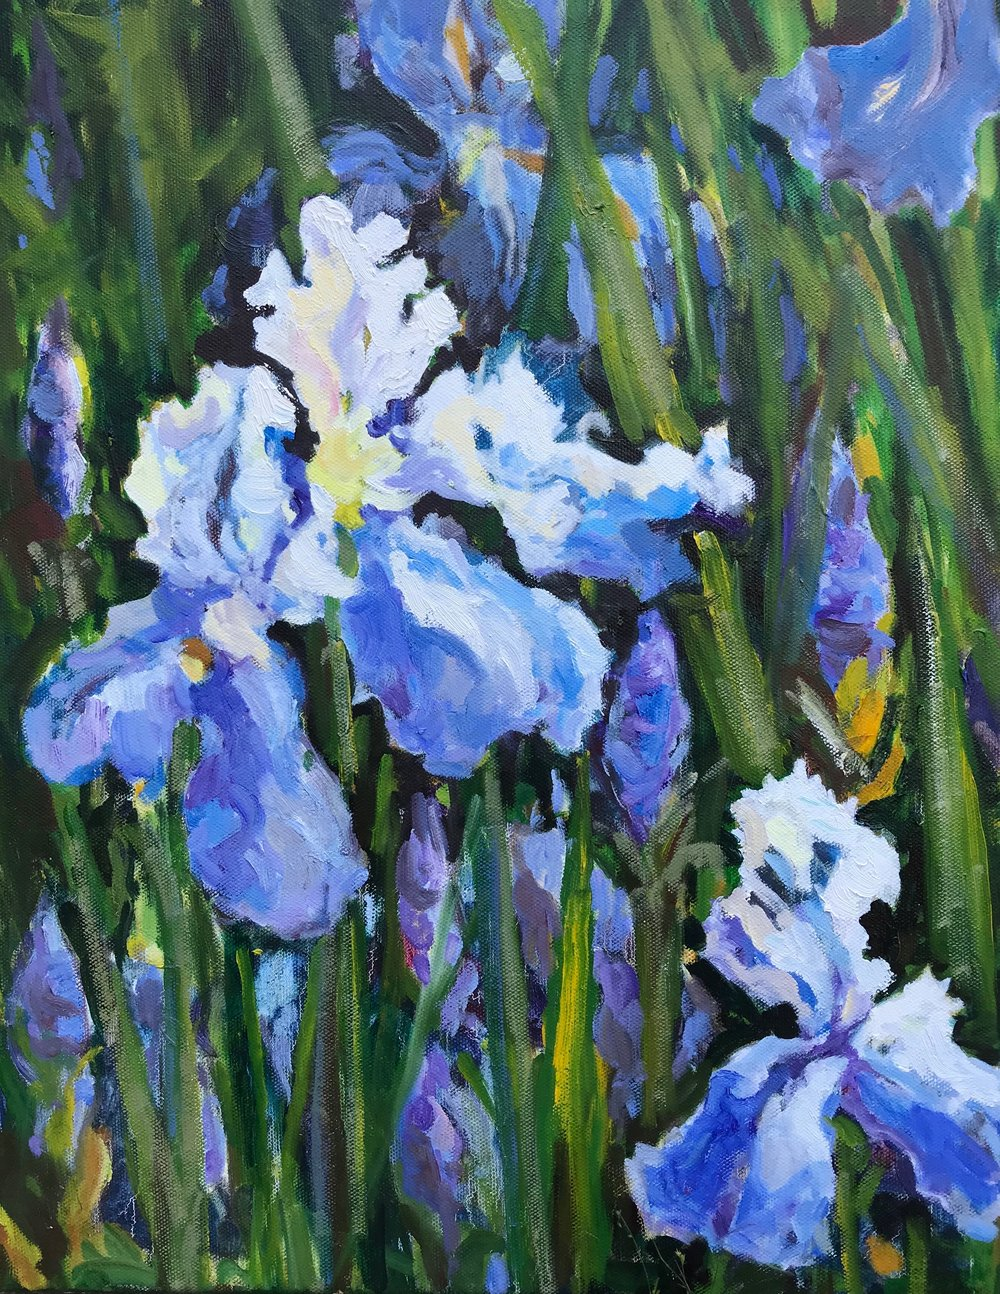 Blue Iris, oils, 14 x 18